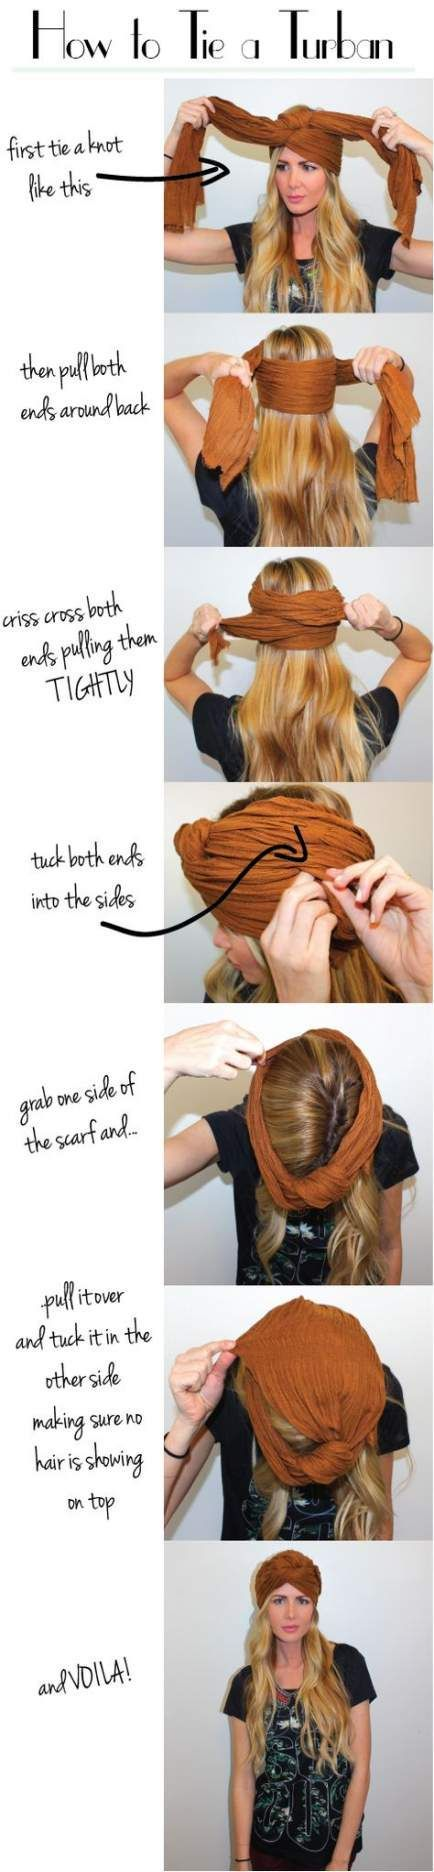 56 Ideas For How To Wear A Bandana Tutorial Headscarves